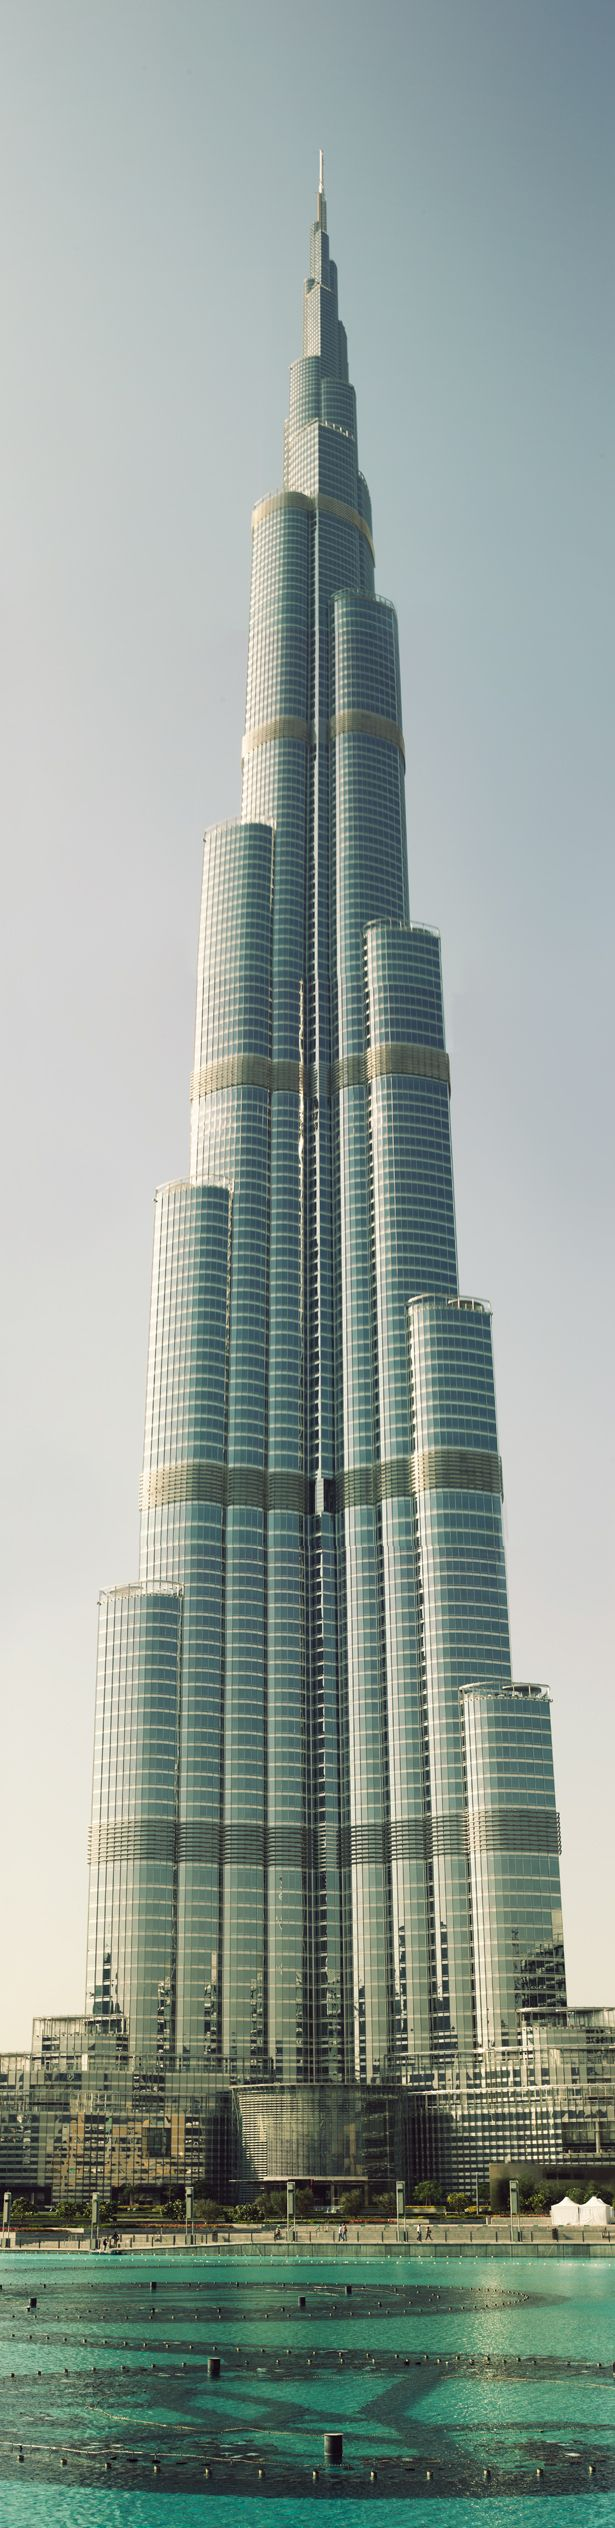 25 best ideas about amazing architecture on pinterest for Dubai architecture moderne